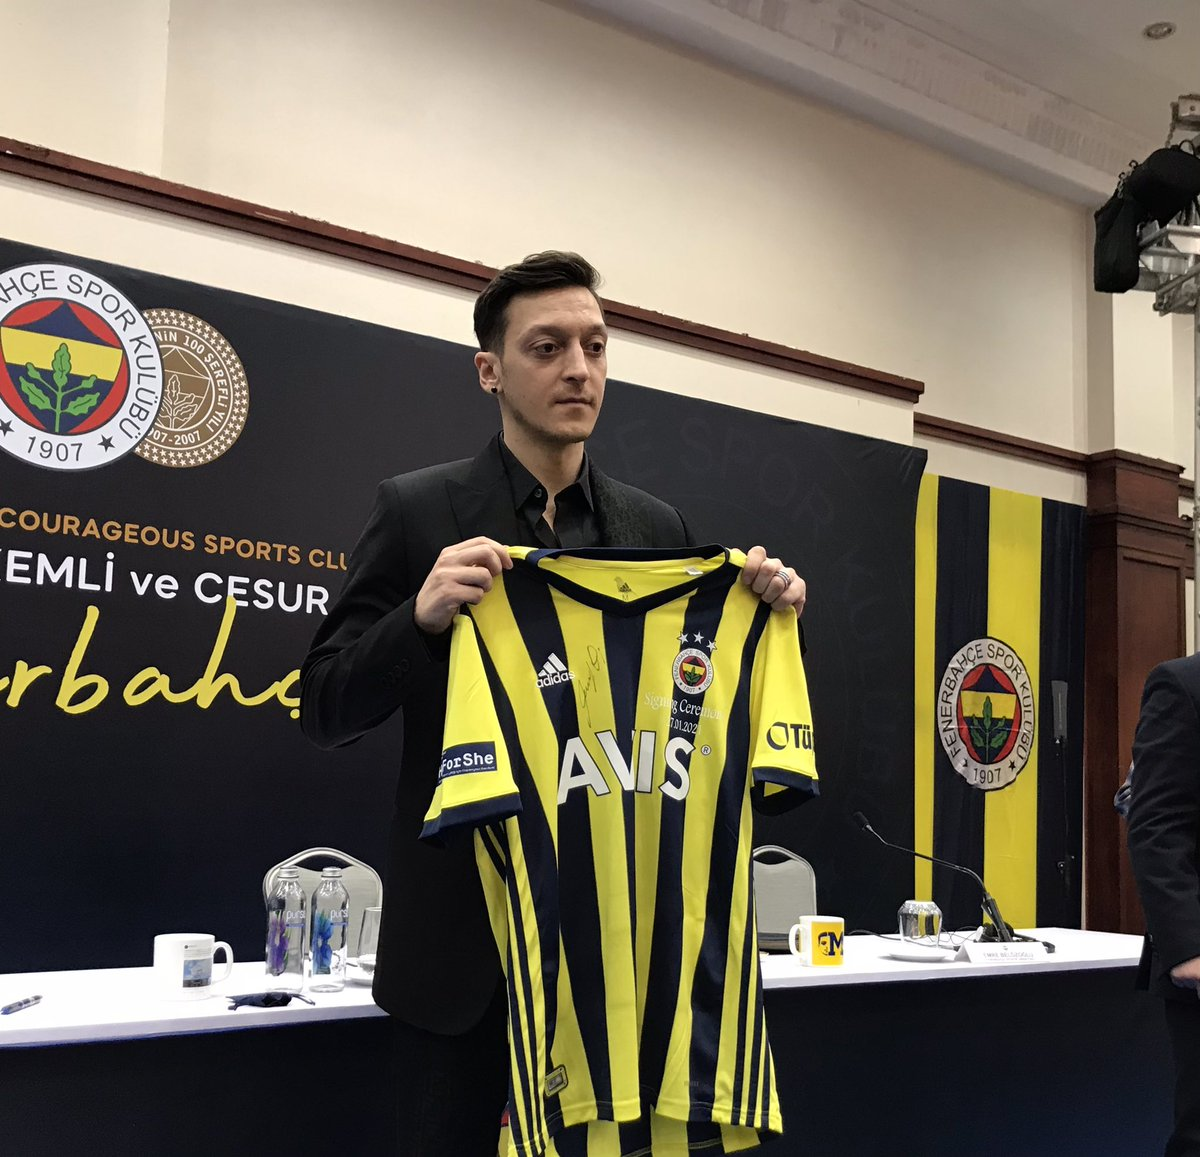 Replying to @Fenerbahce_EN: It's official! Mesut Özil is a Fenerbahçe player! #FenerSignMesut